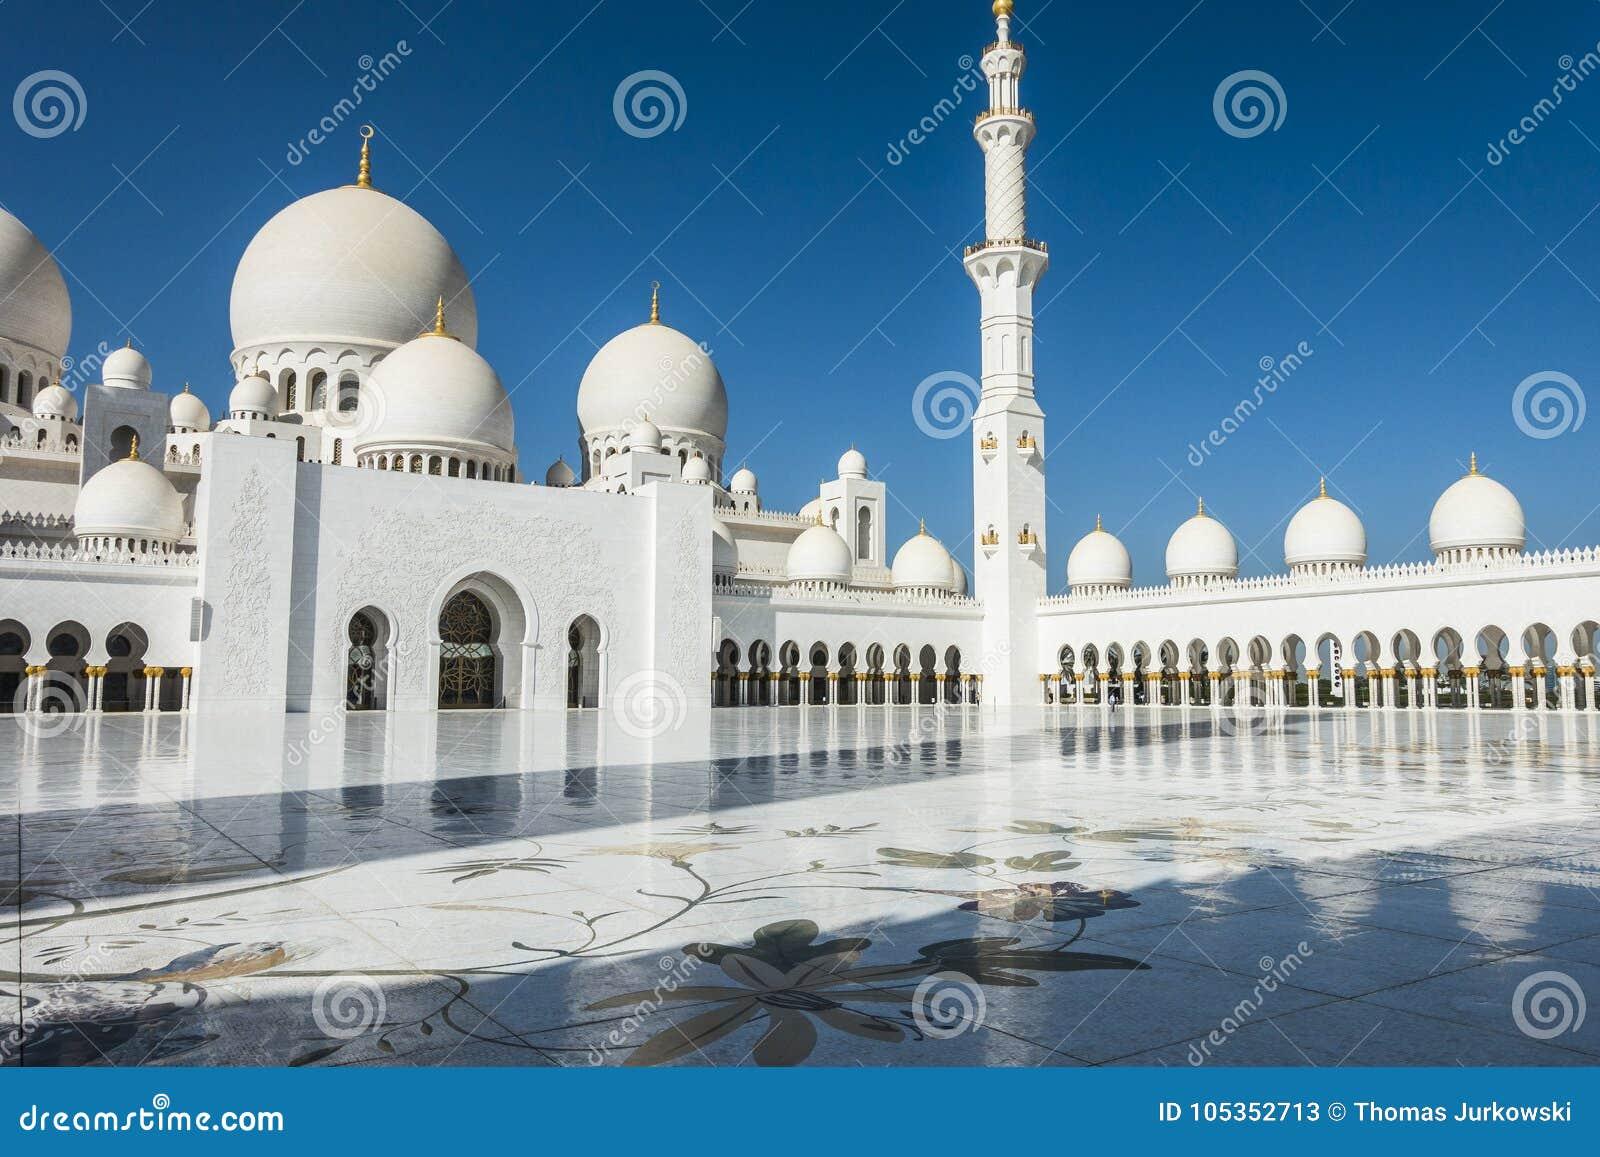 Dubaijumeirah Mosque Stock Image Image Of Religious